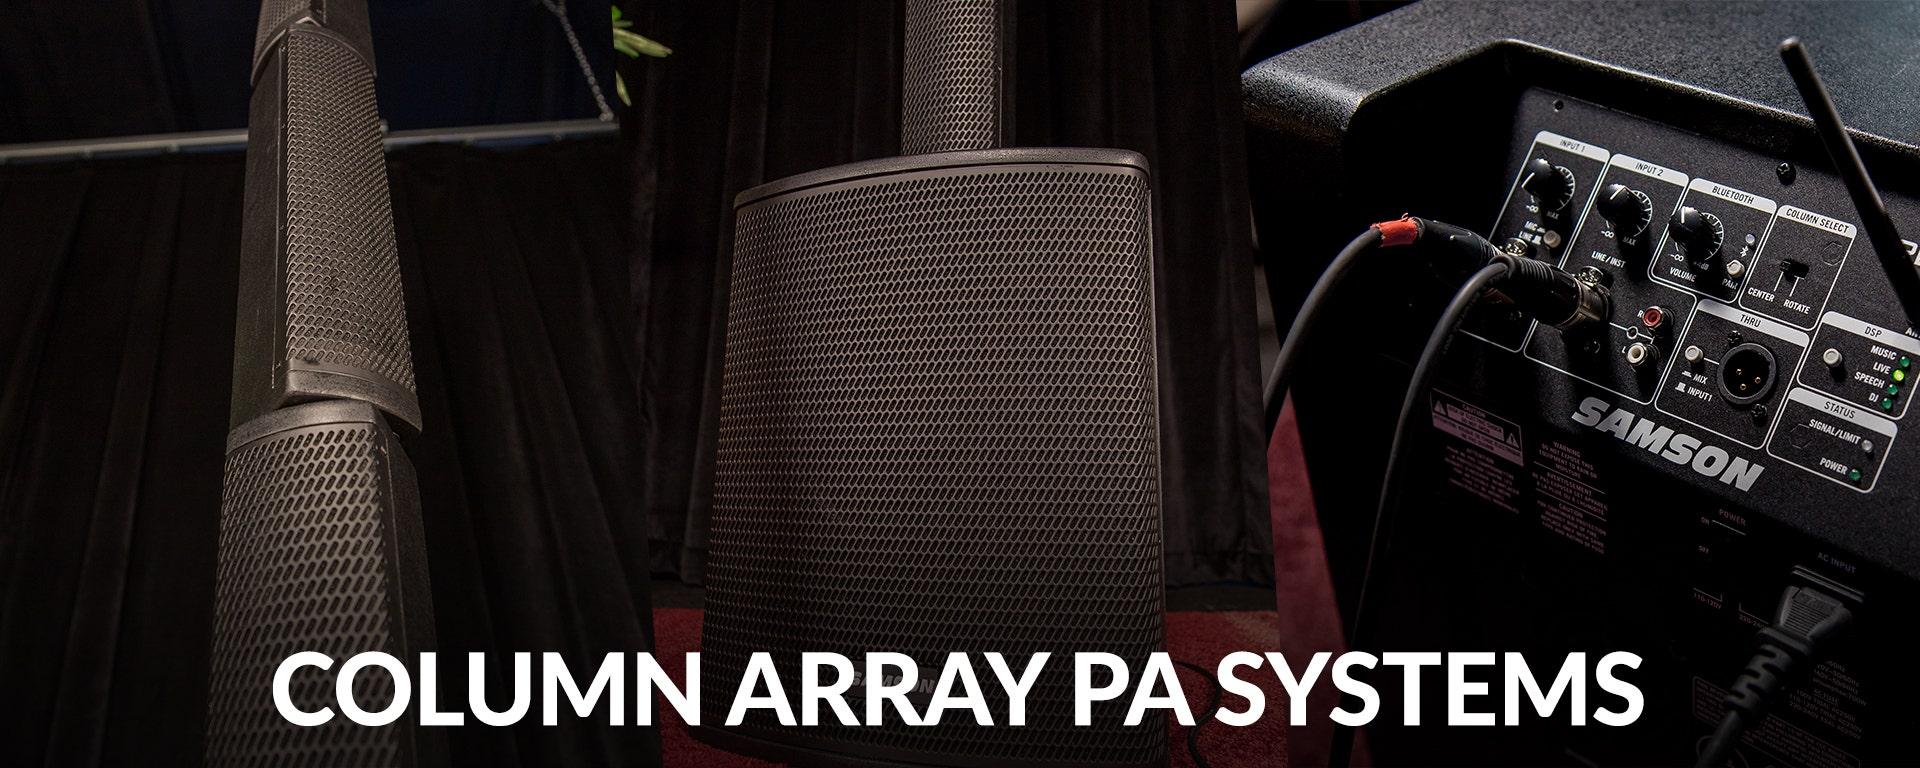 Column Array PA Systems at SamAsh.com